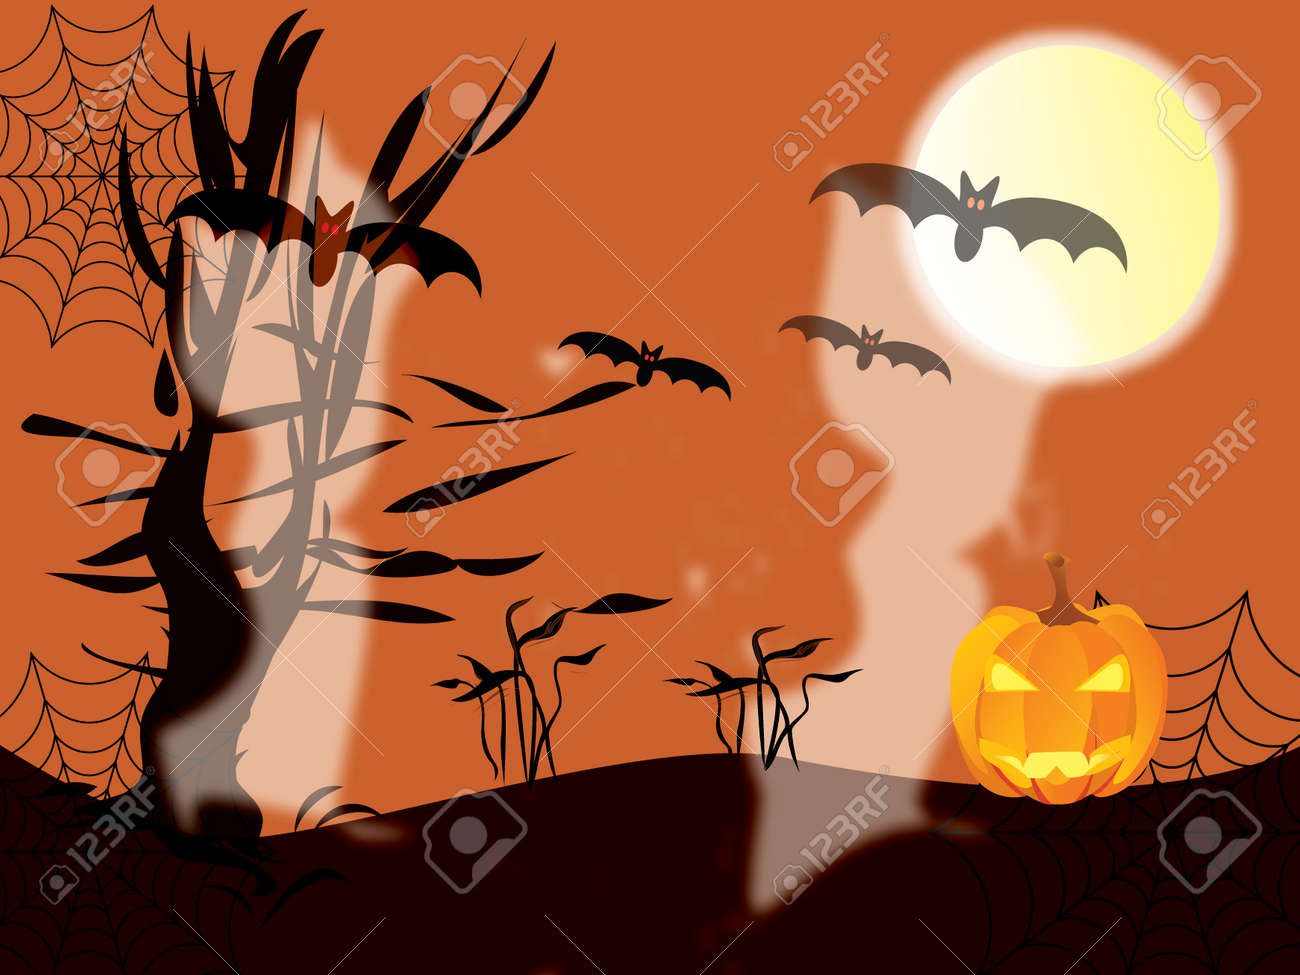 Halloween concept with pumpkin, tree, ghosts, bats, moon and texture Stock Vector - 7958192